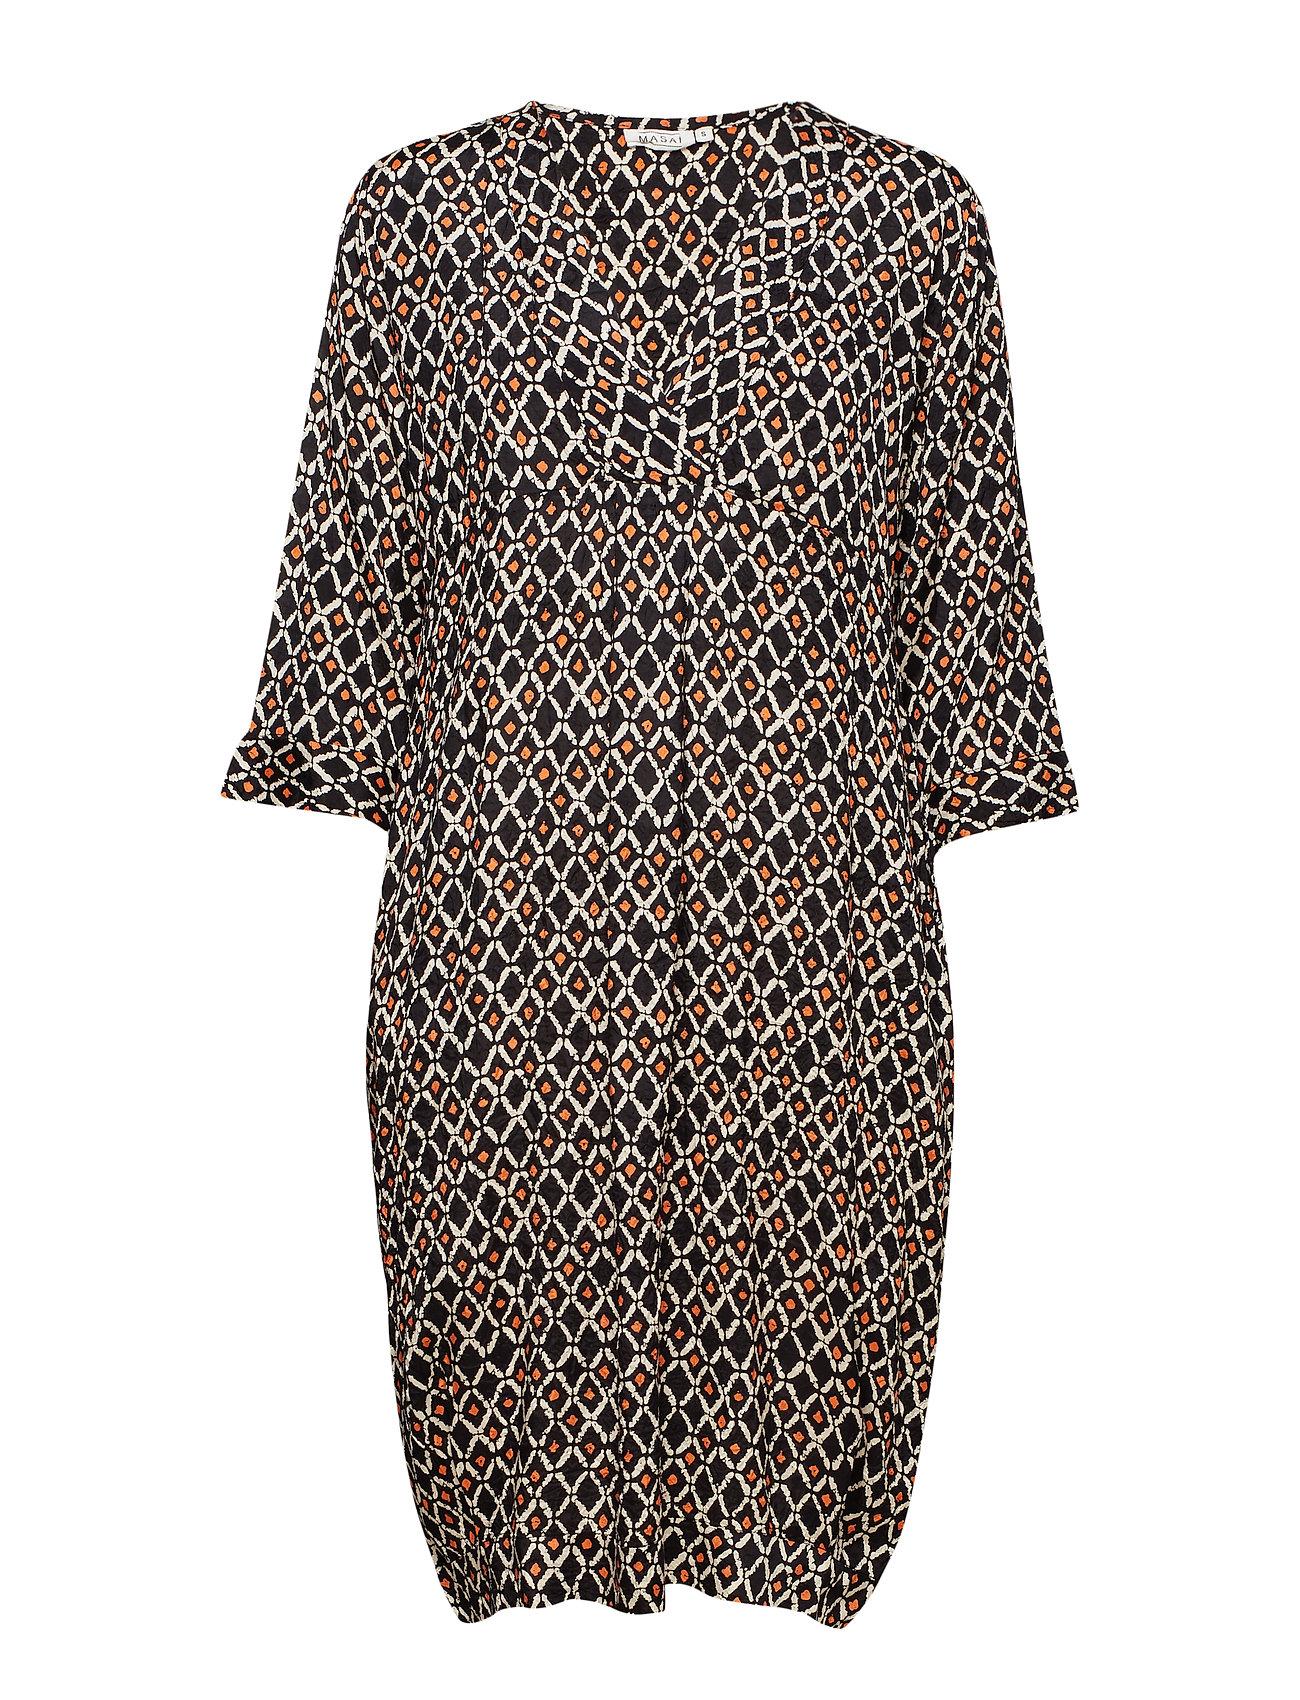 Masai Nakato dress - ORANGE ORG